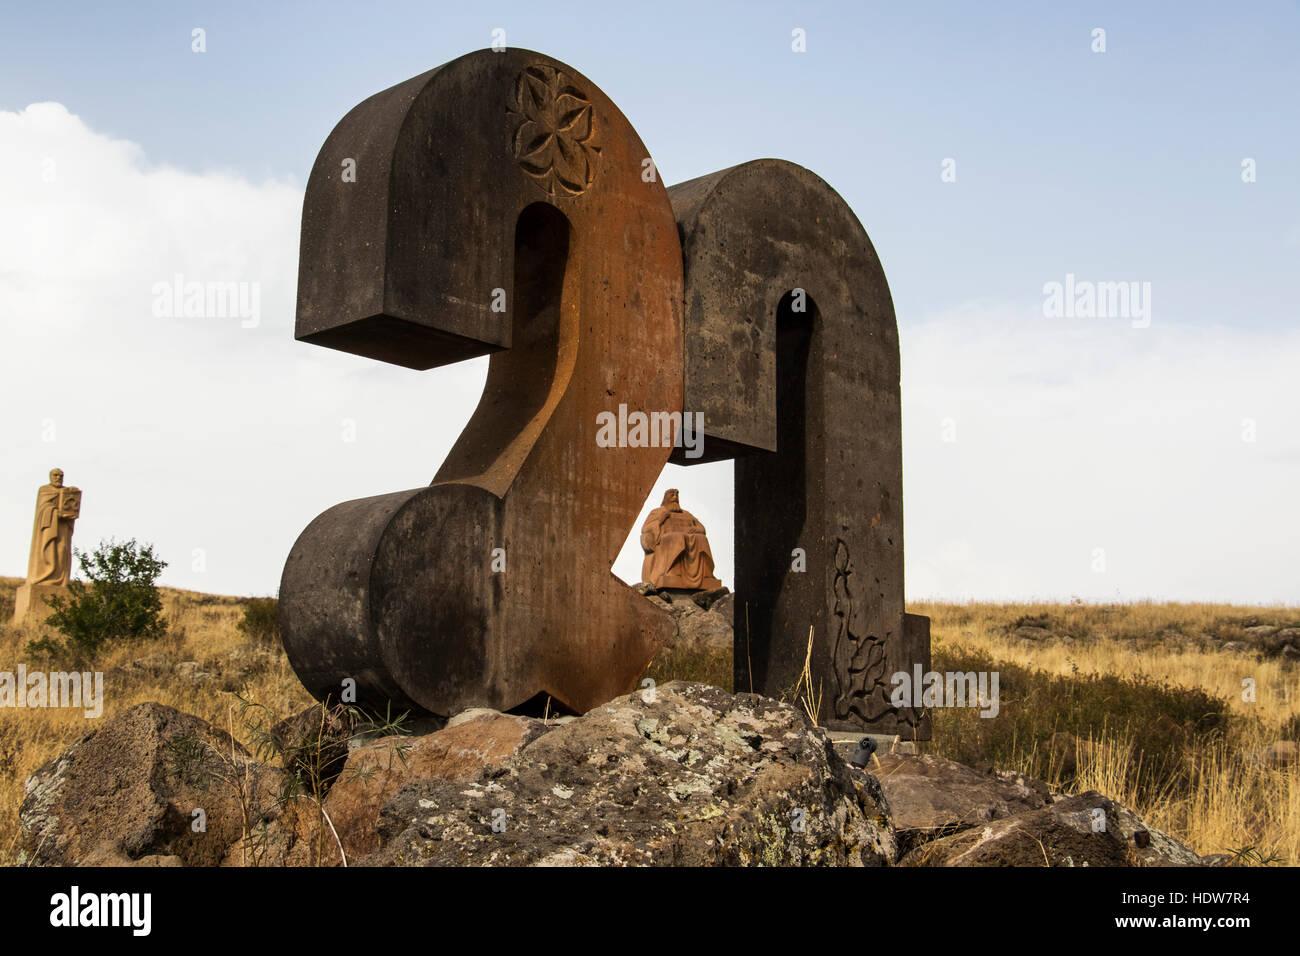 Armenisches Alphabet Denkmal Stockfotos & Armenisches Alphabet